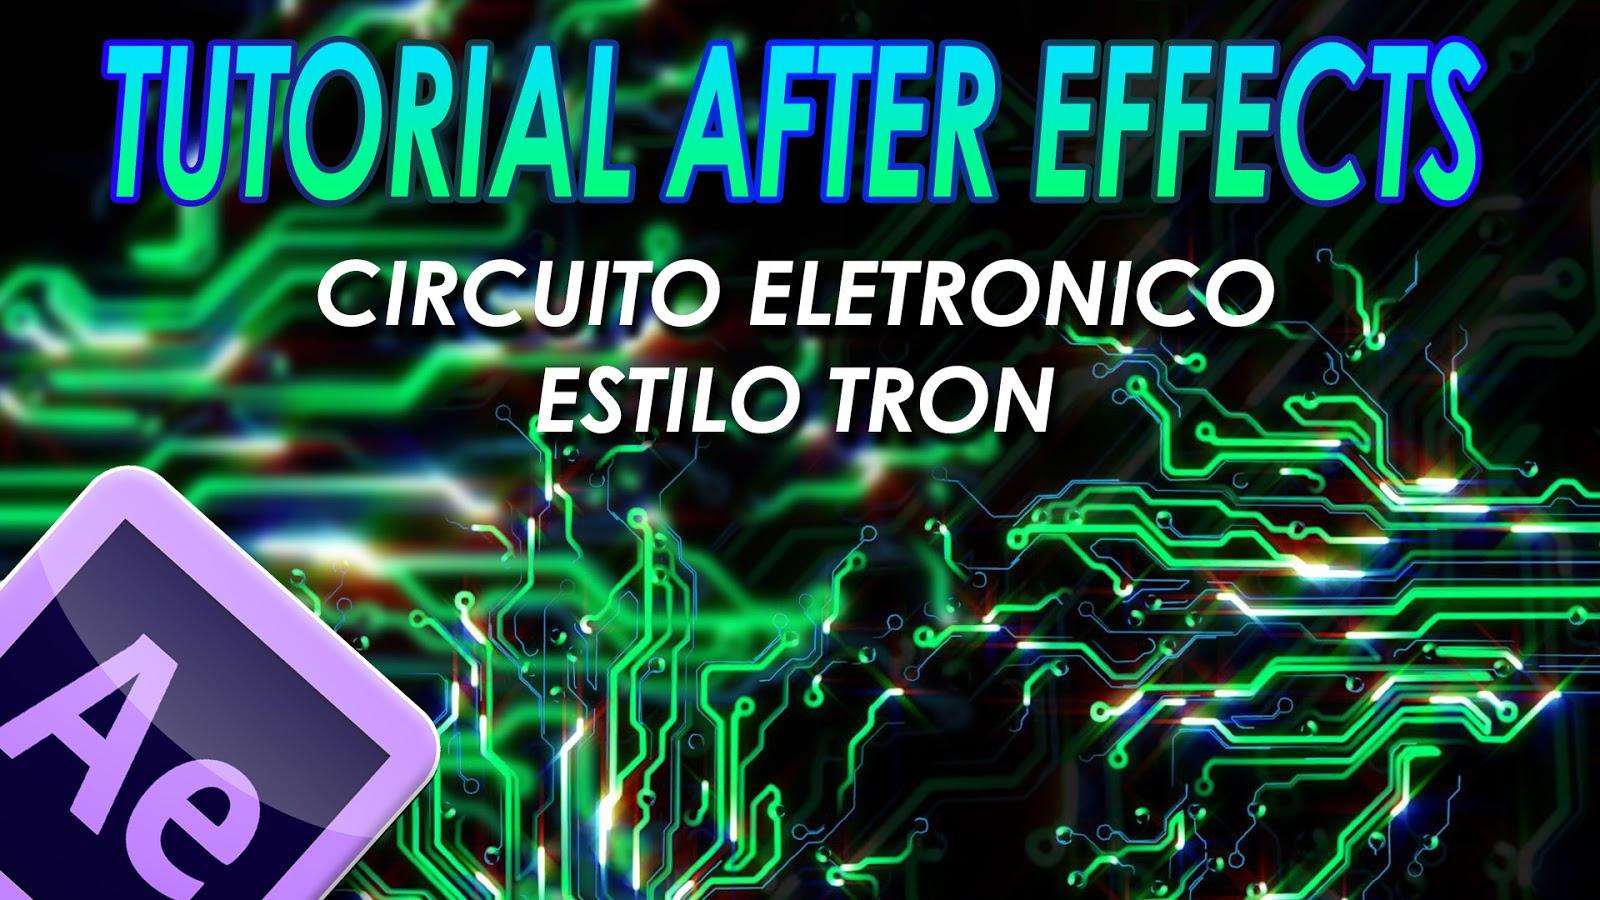 Circuito Electronico : Simply d tutoriales circuito electronico estilo tron en after effets